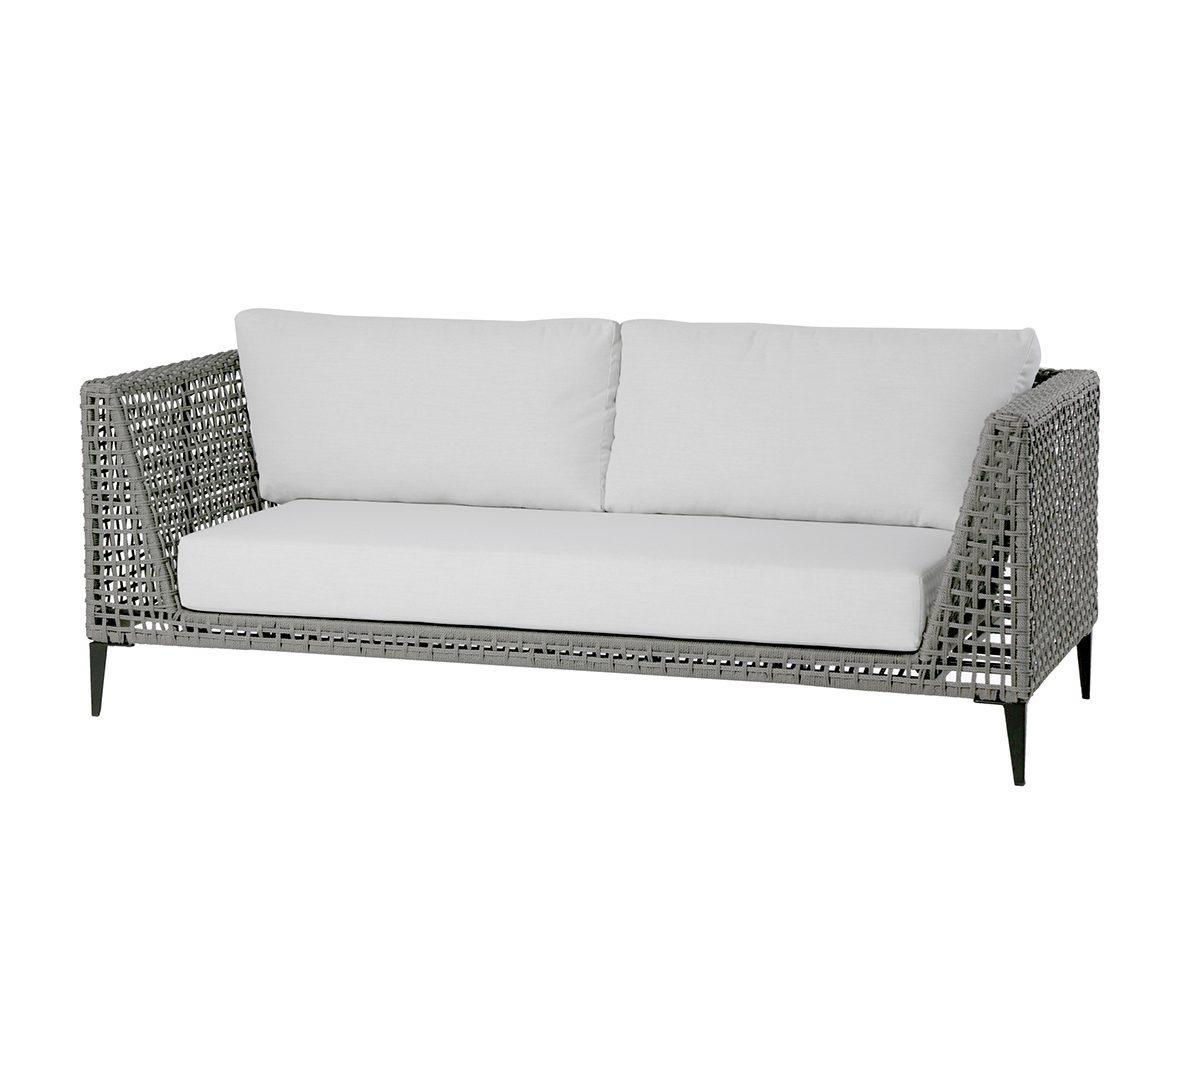 Genval 2.5 Seater Sofa | Patio Bay